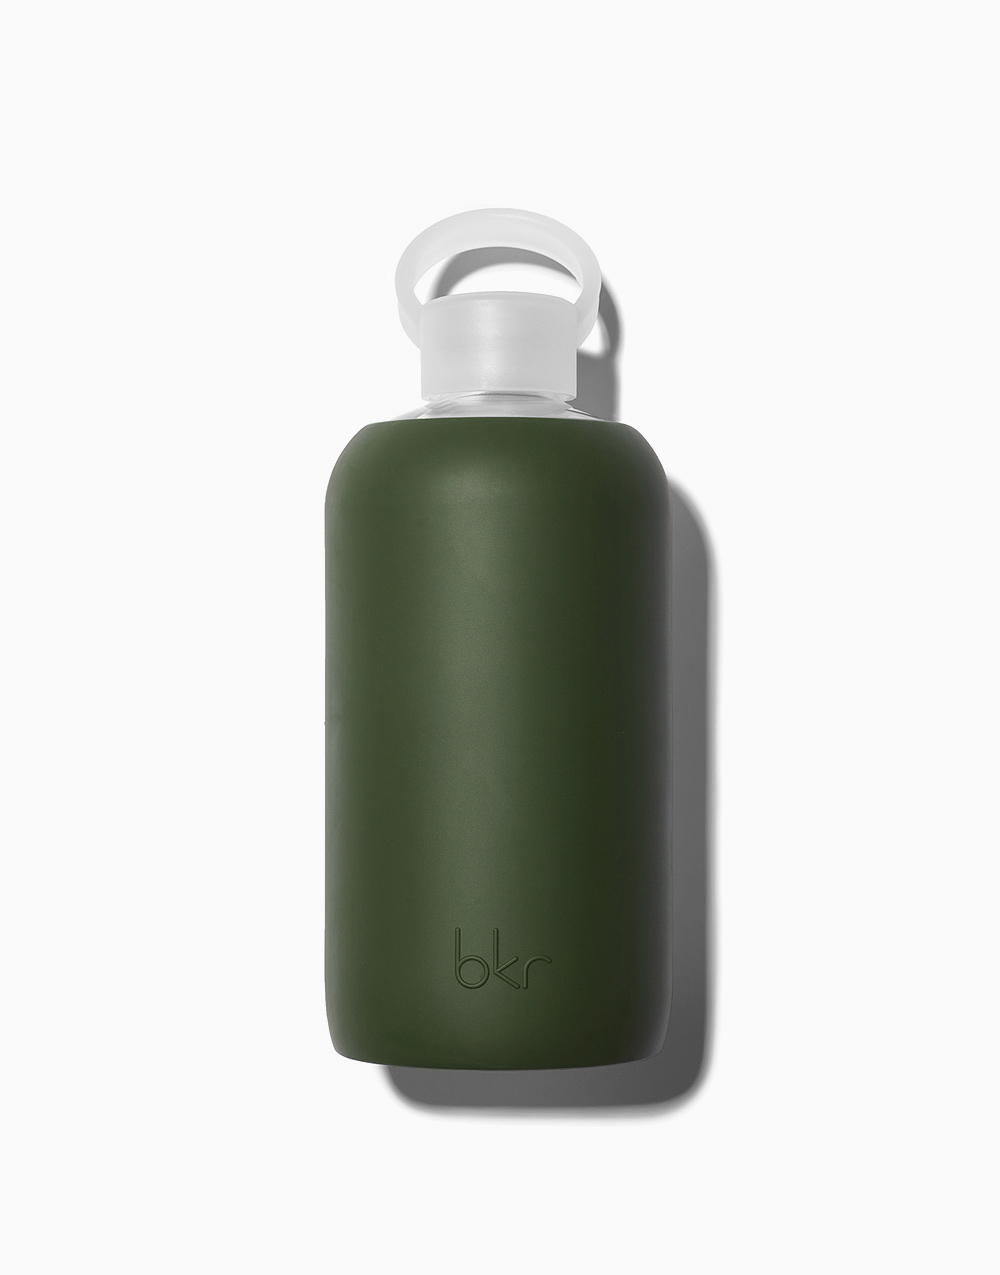 Big Water Bottle (1L) by Bkr | Cash